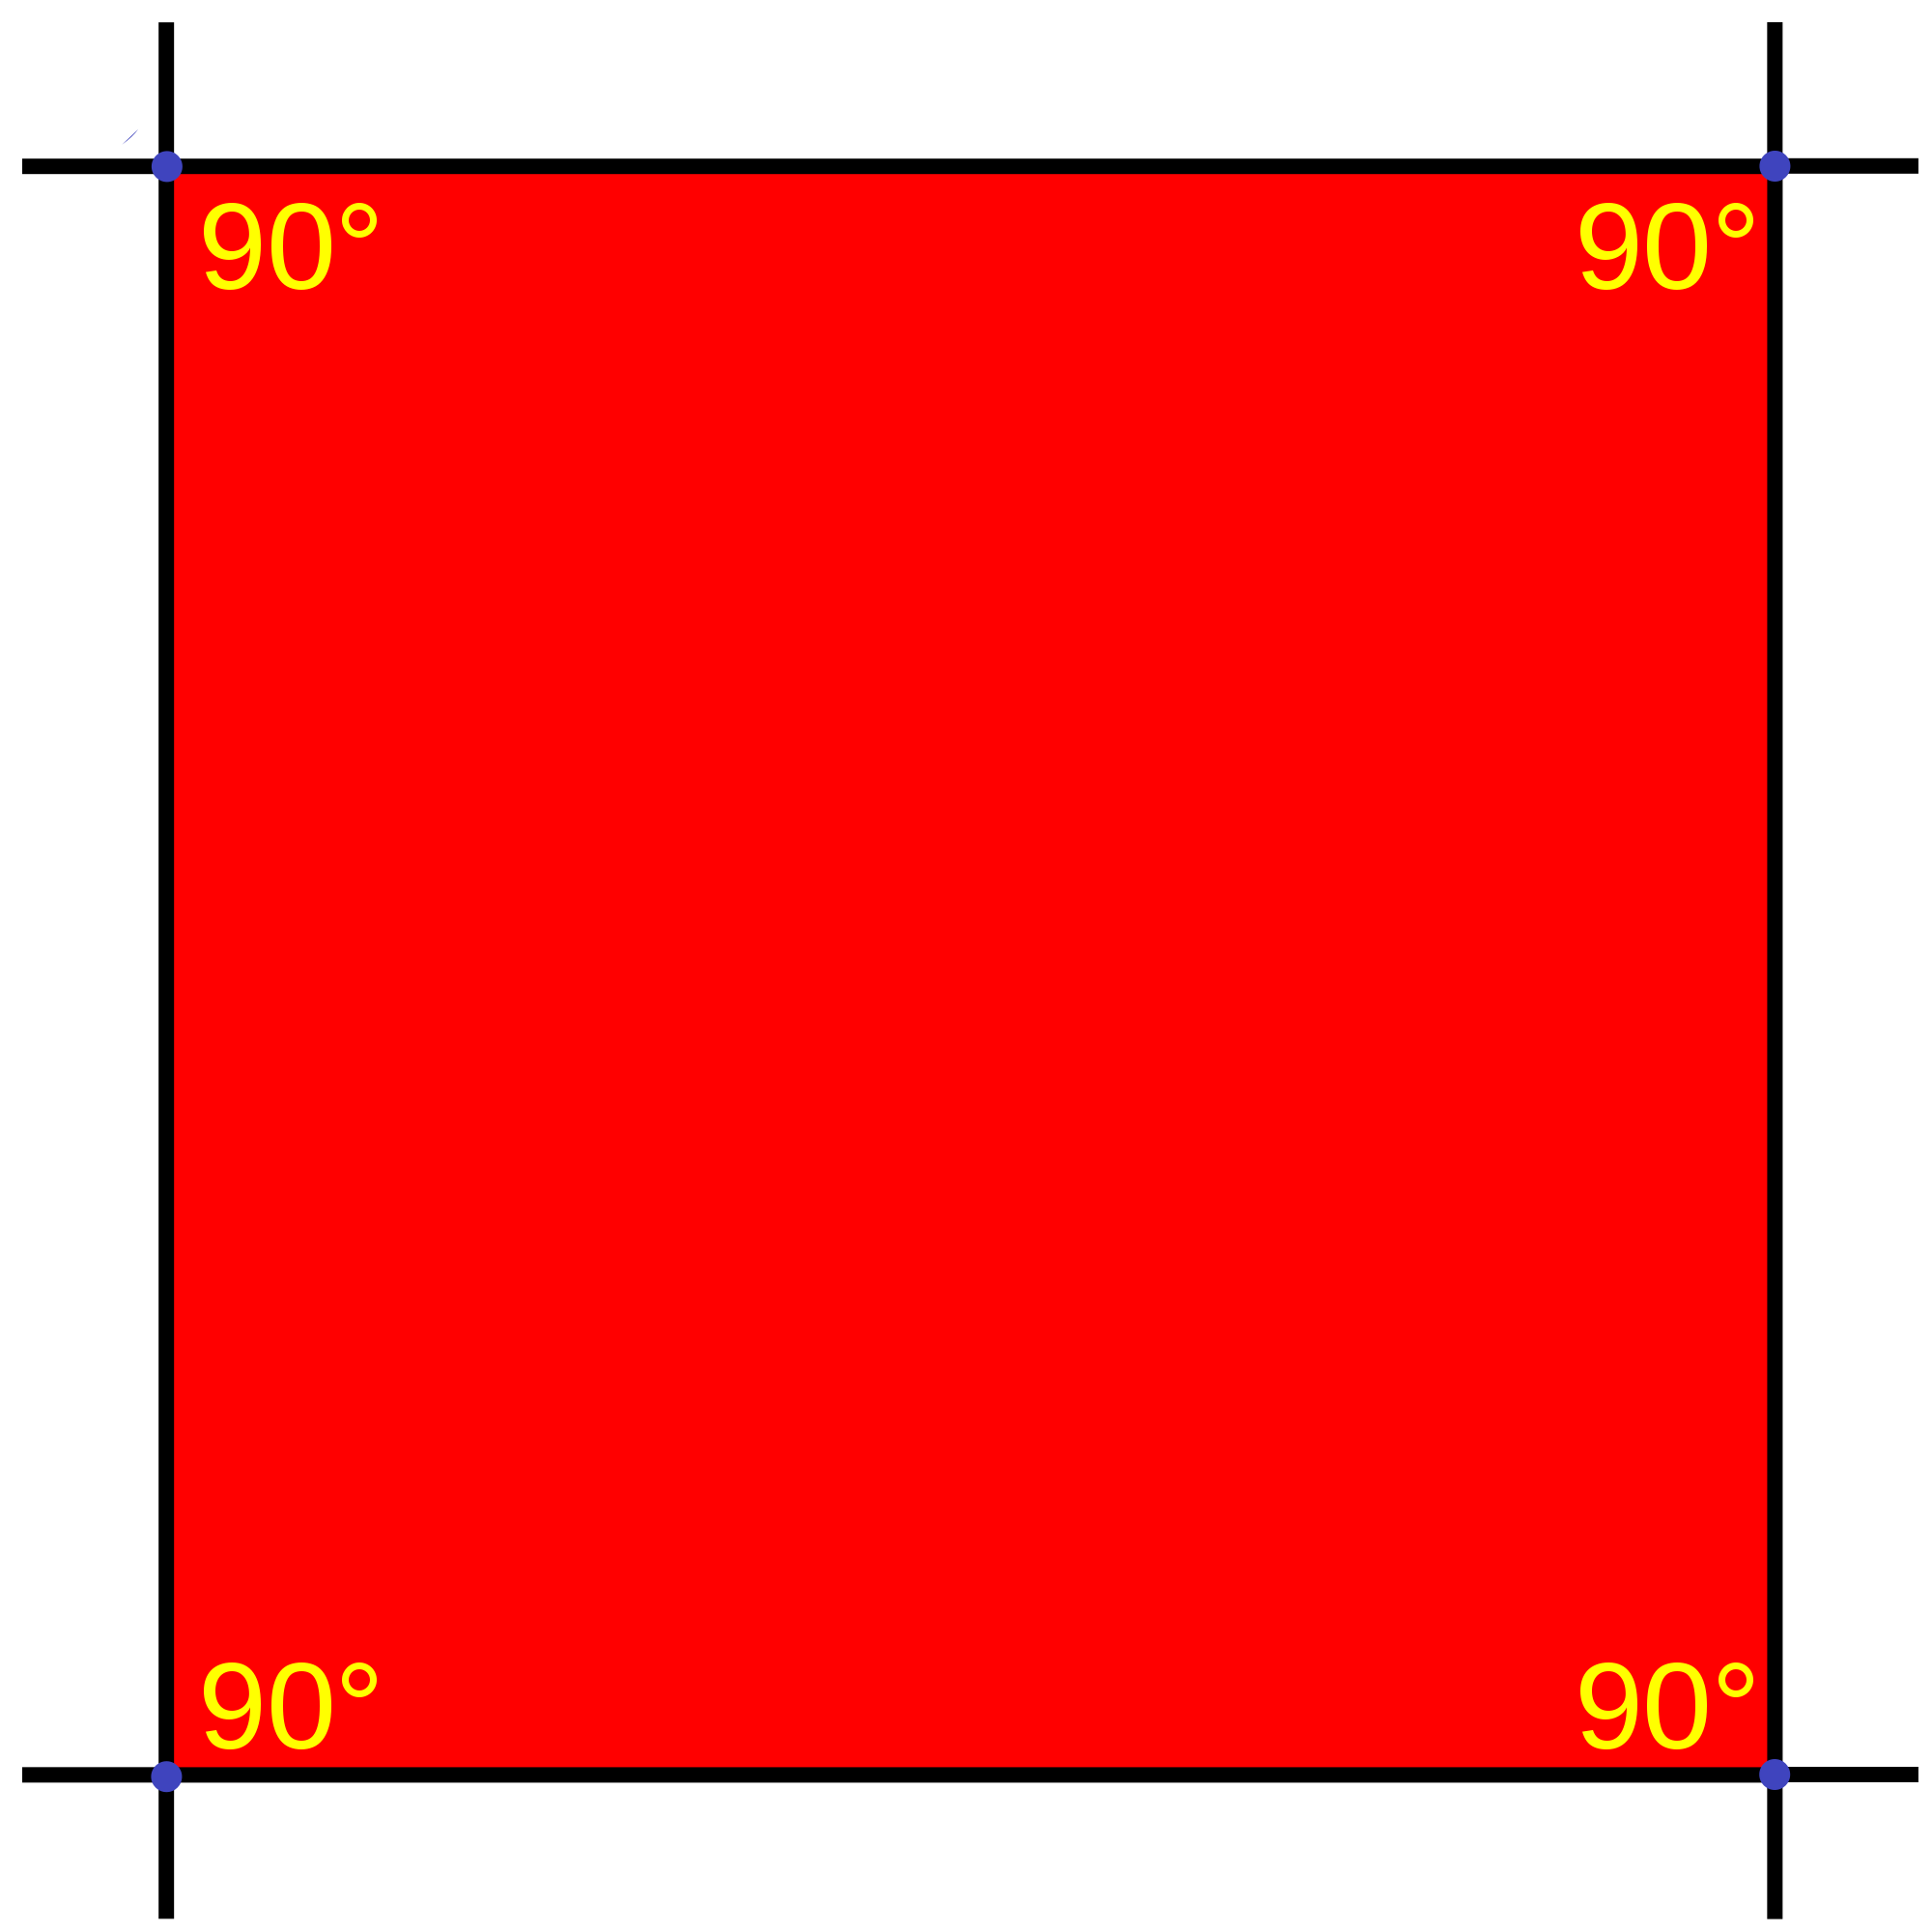 Square - Wikipedia, the free encyclopedia